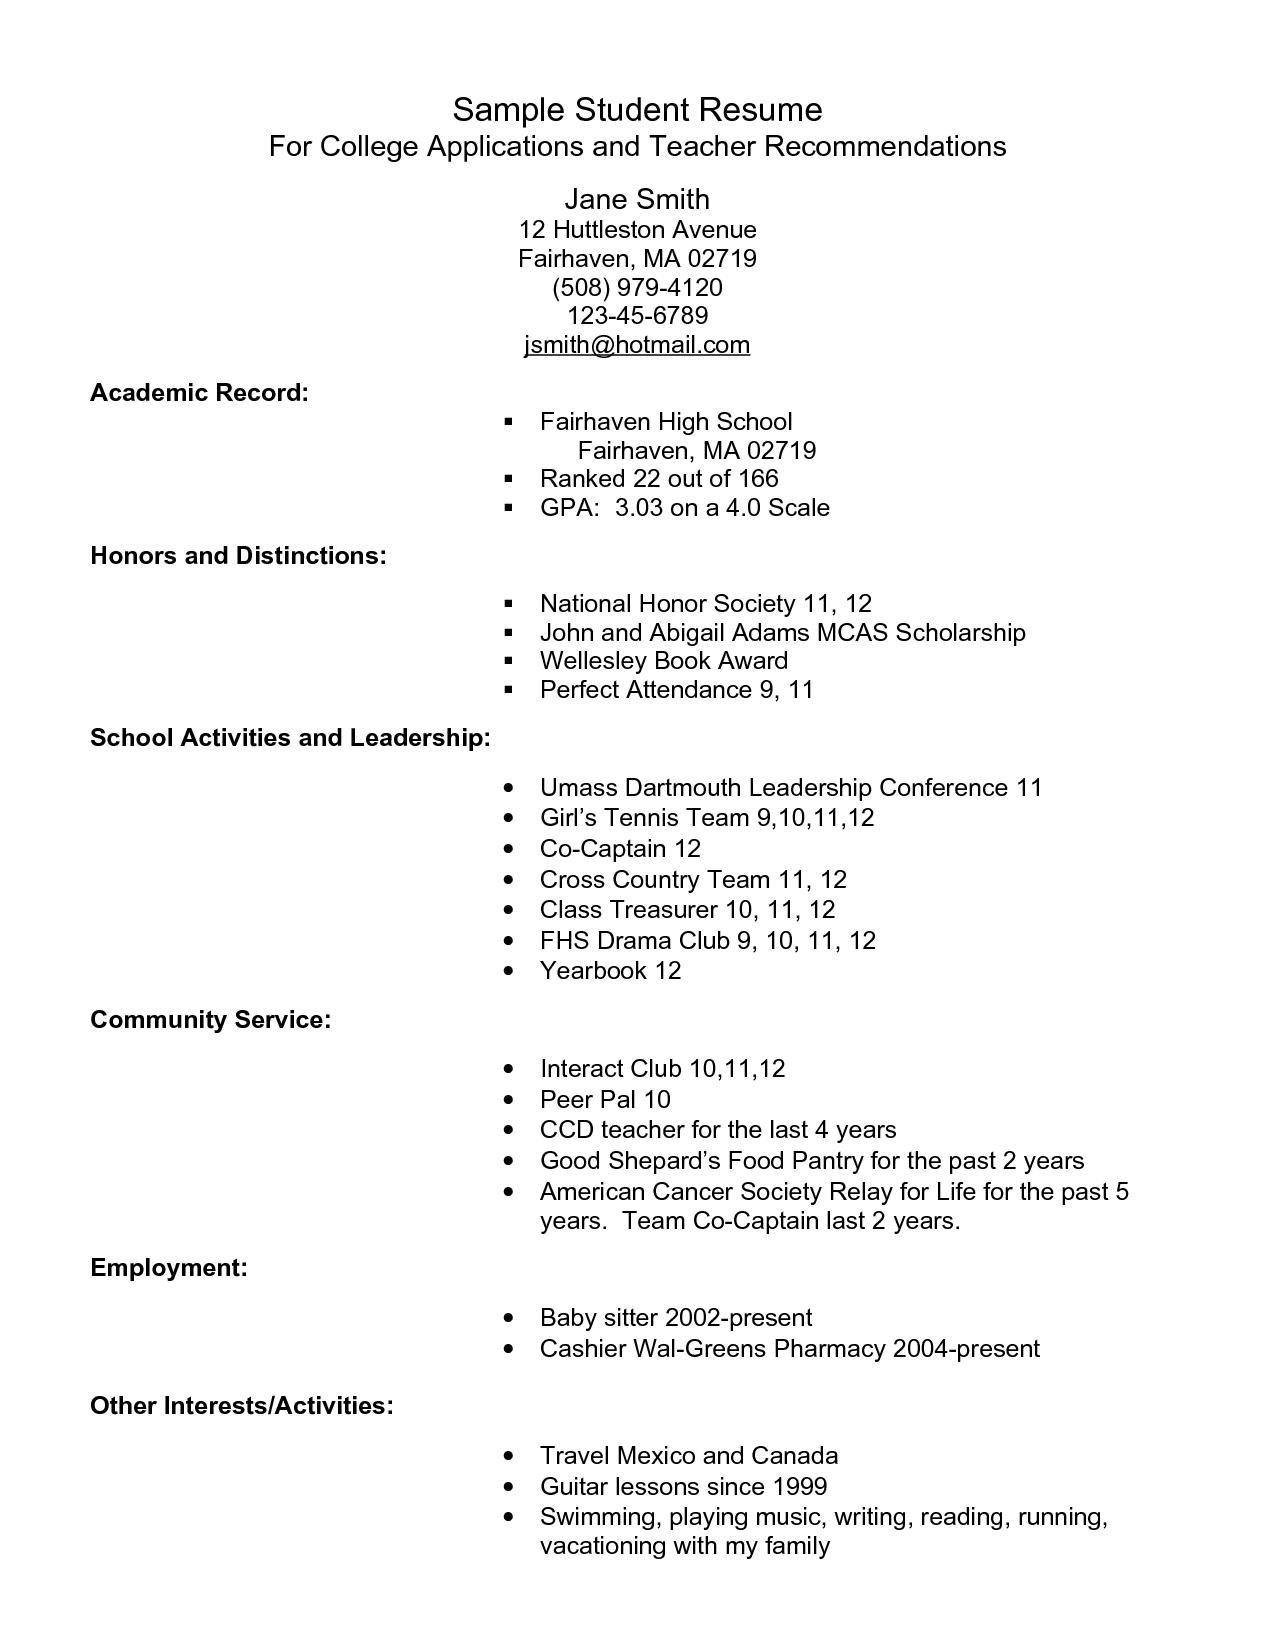 Resume Format For Graduate School Application